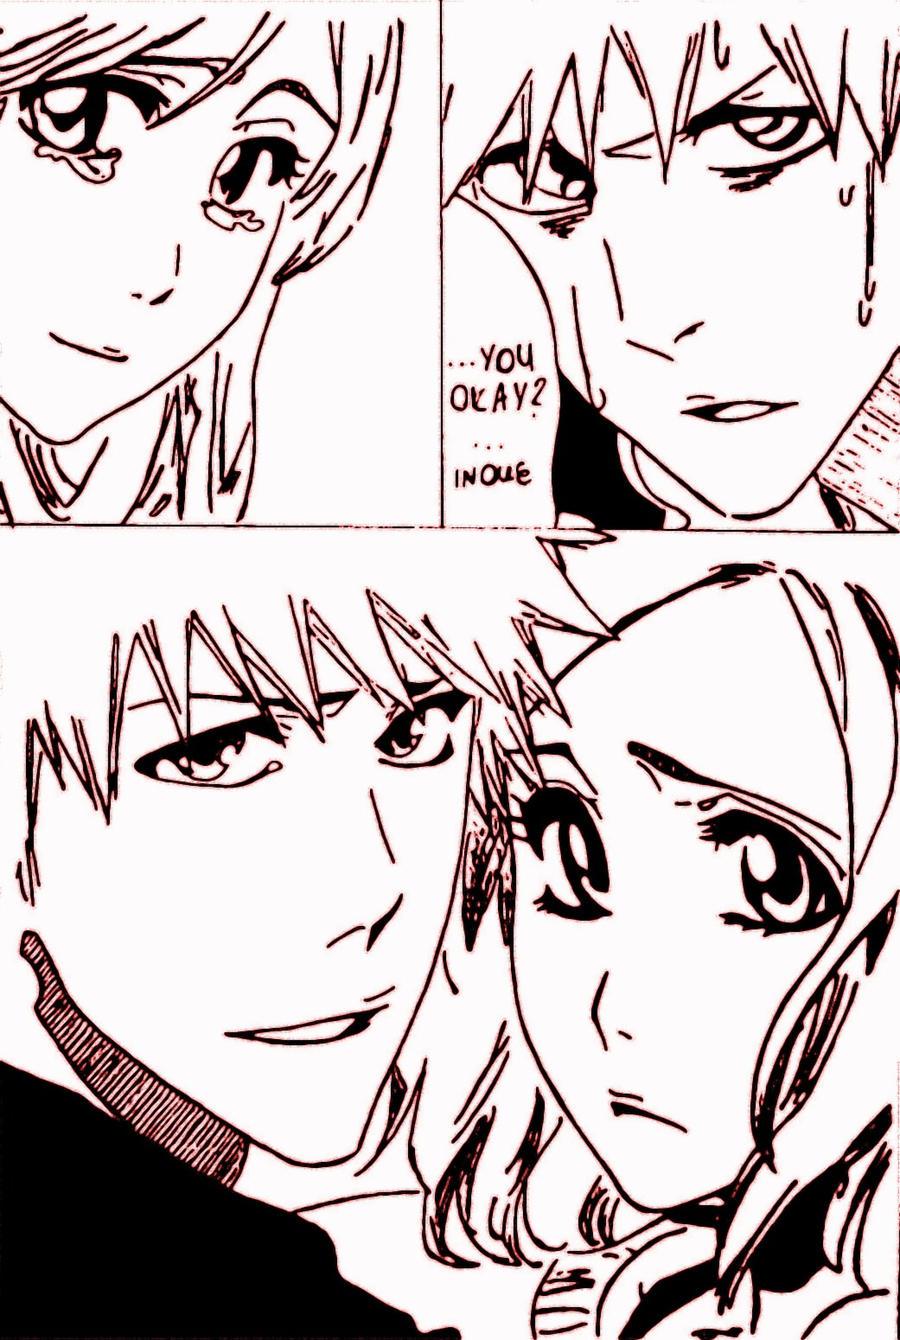 ichigo and orihime moments - photo #5